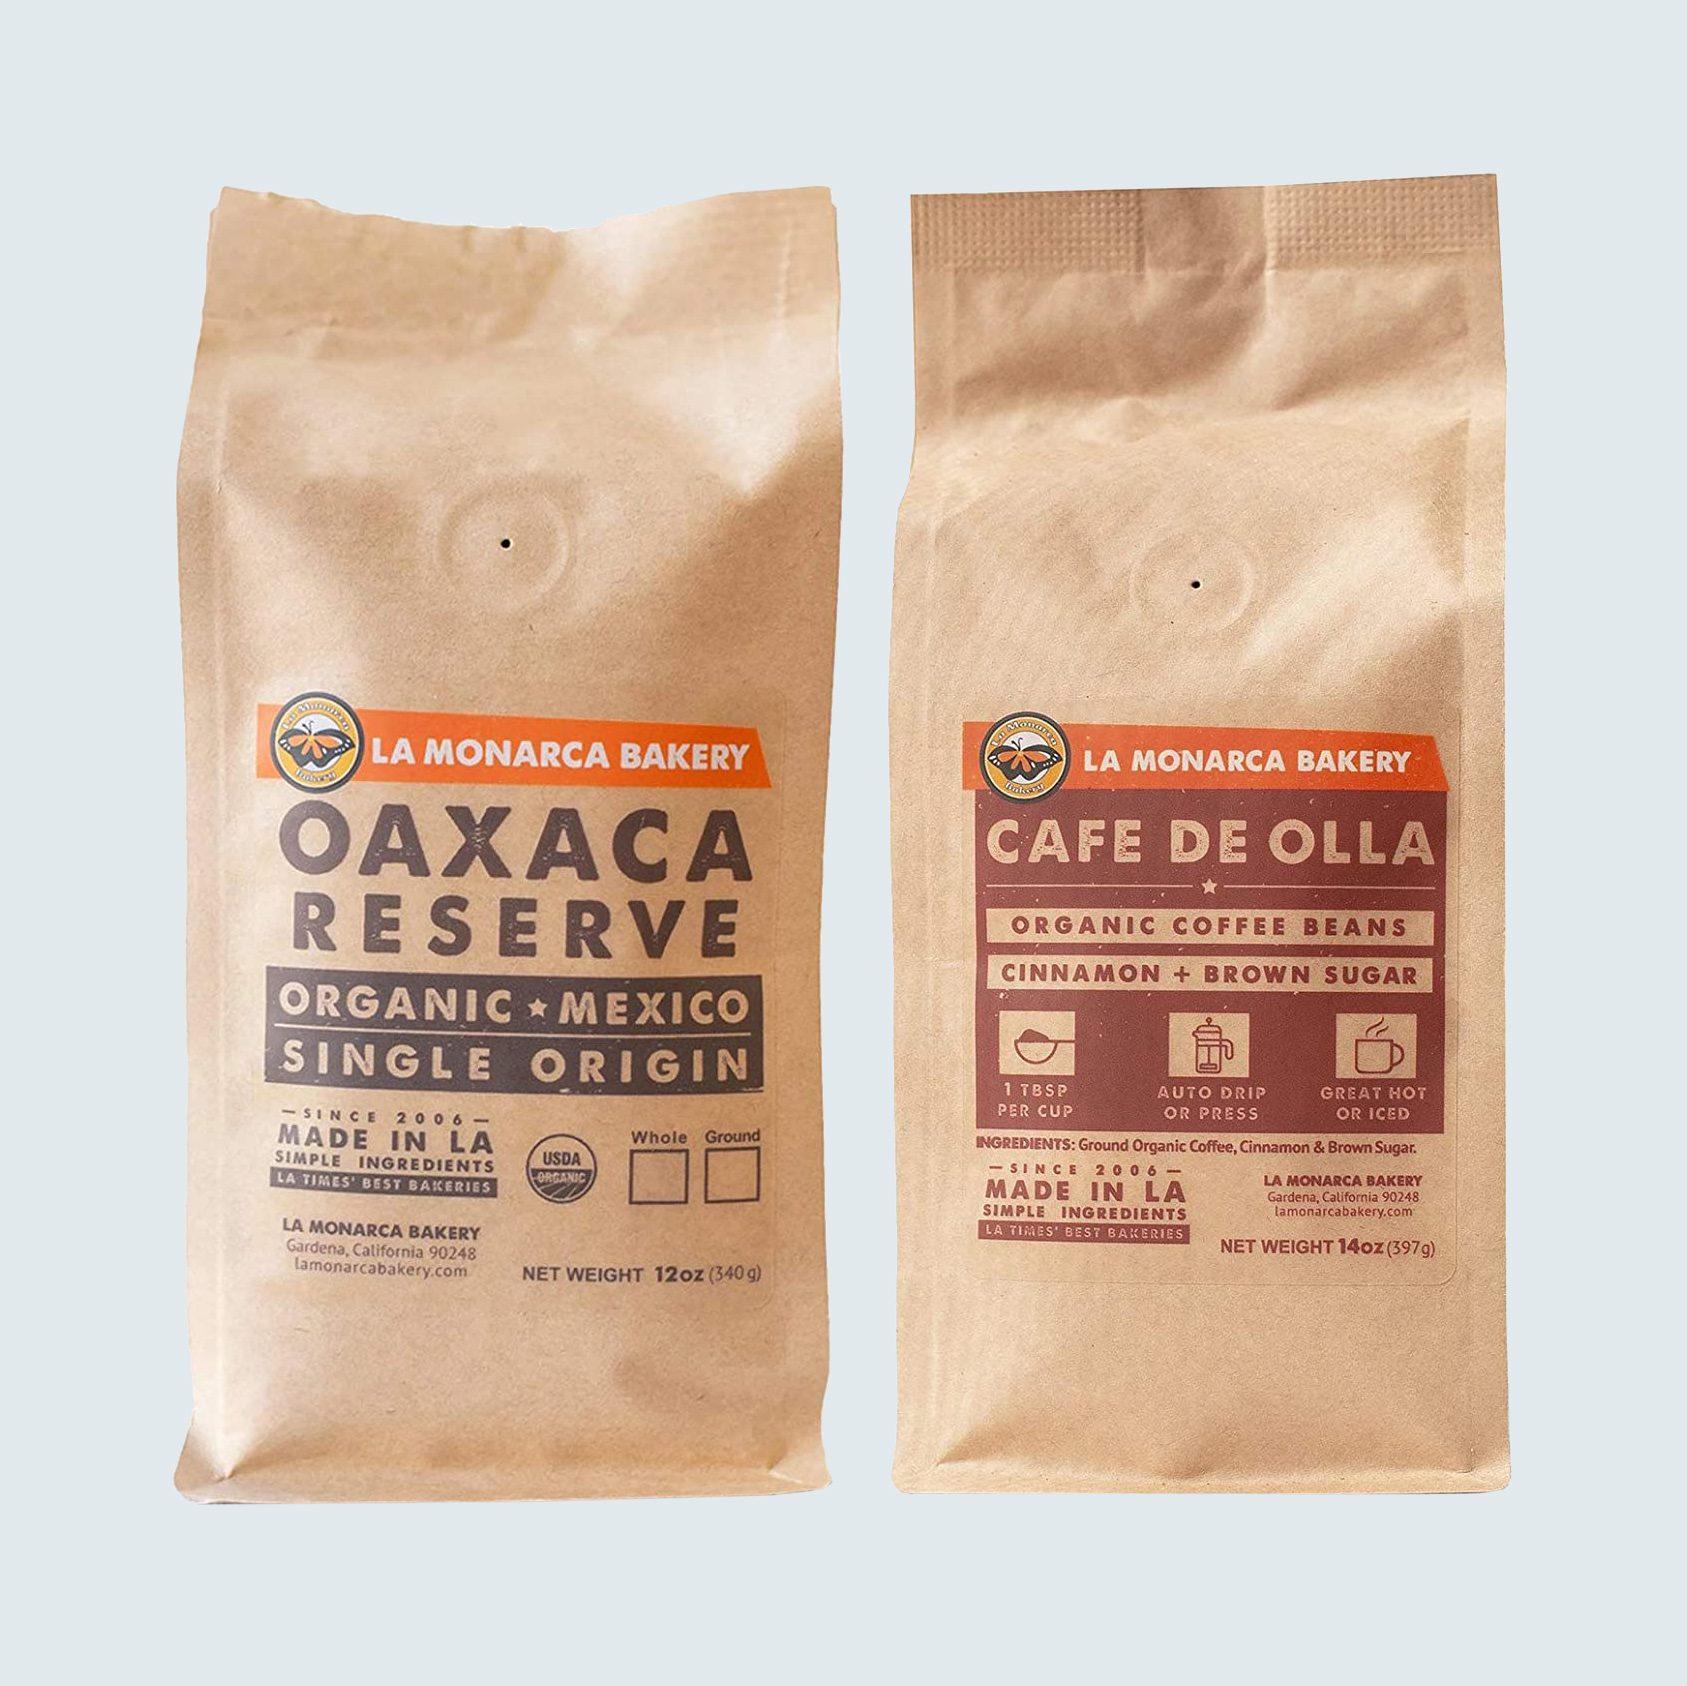 La Manorca Café de Ollo and Oaxaca Reserve, pack of 2